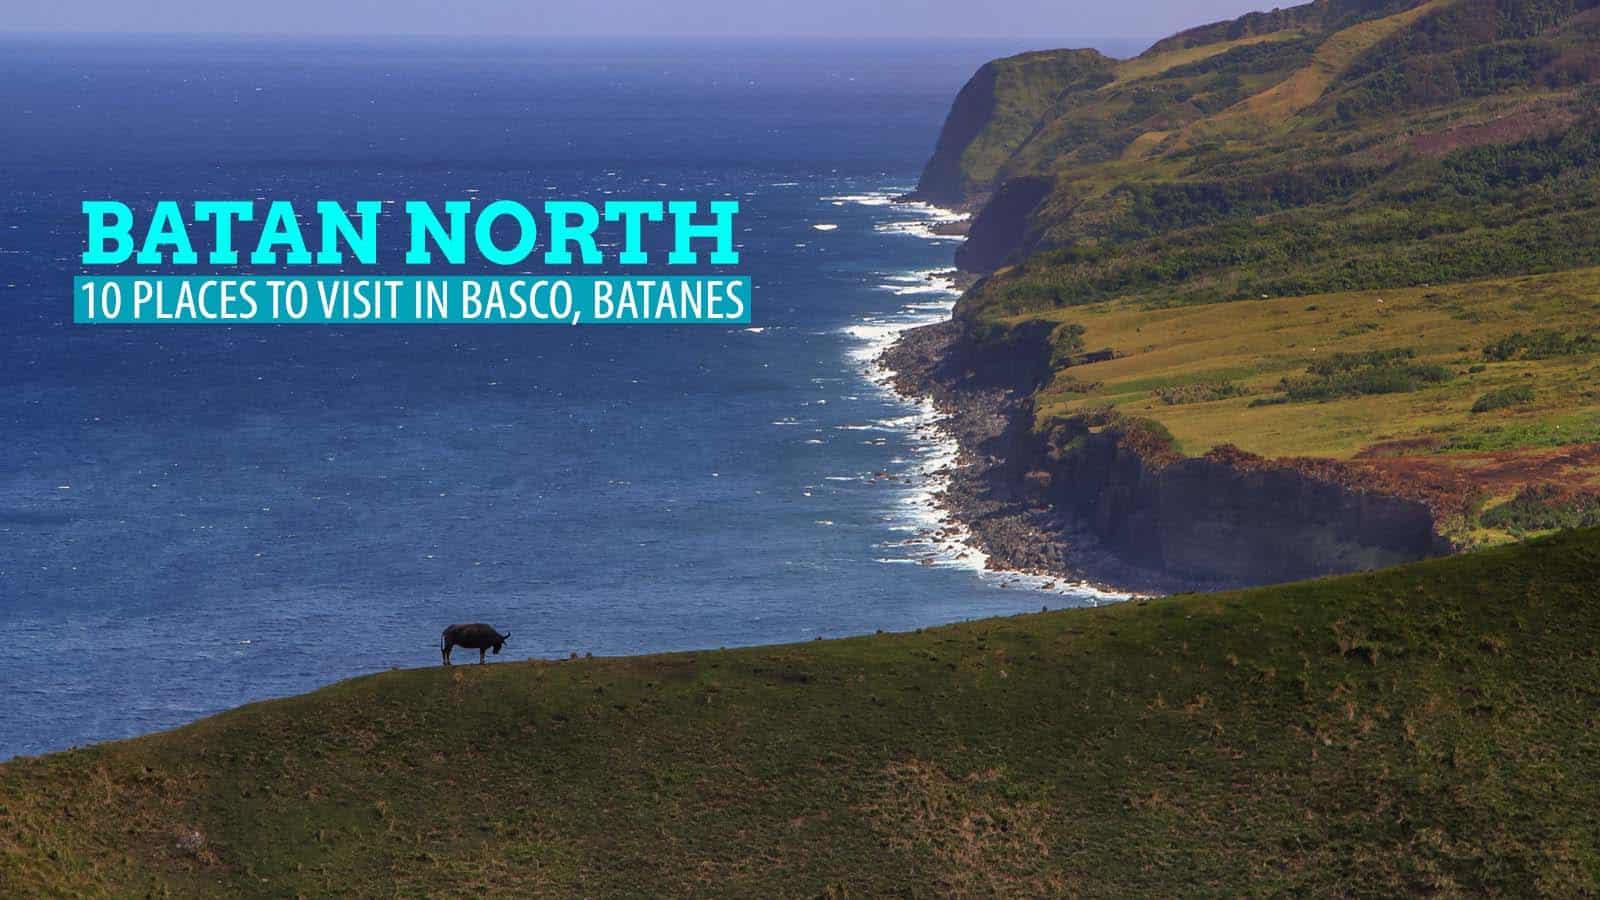 North-Batanes Philippines